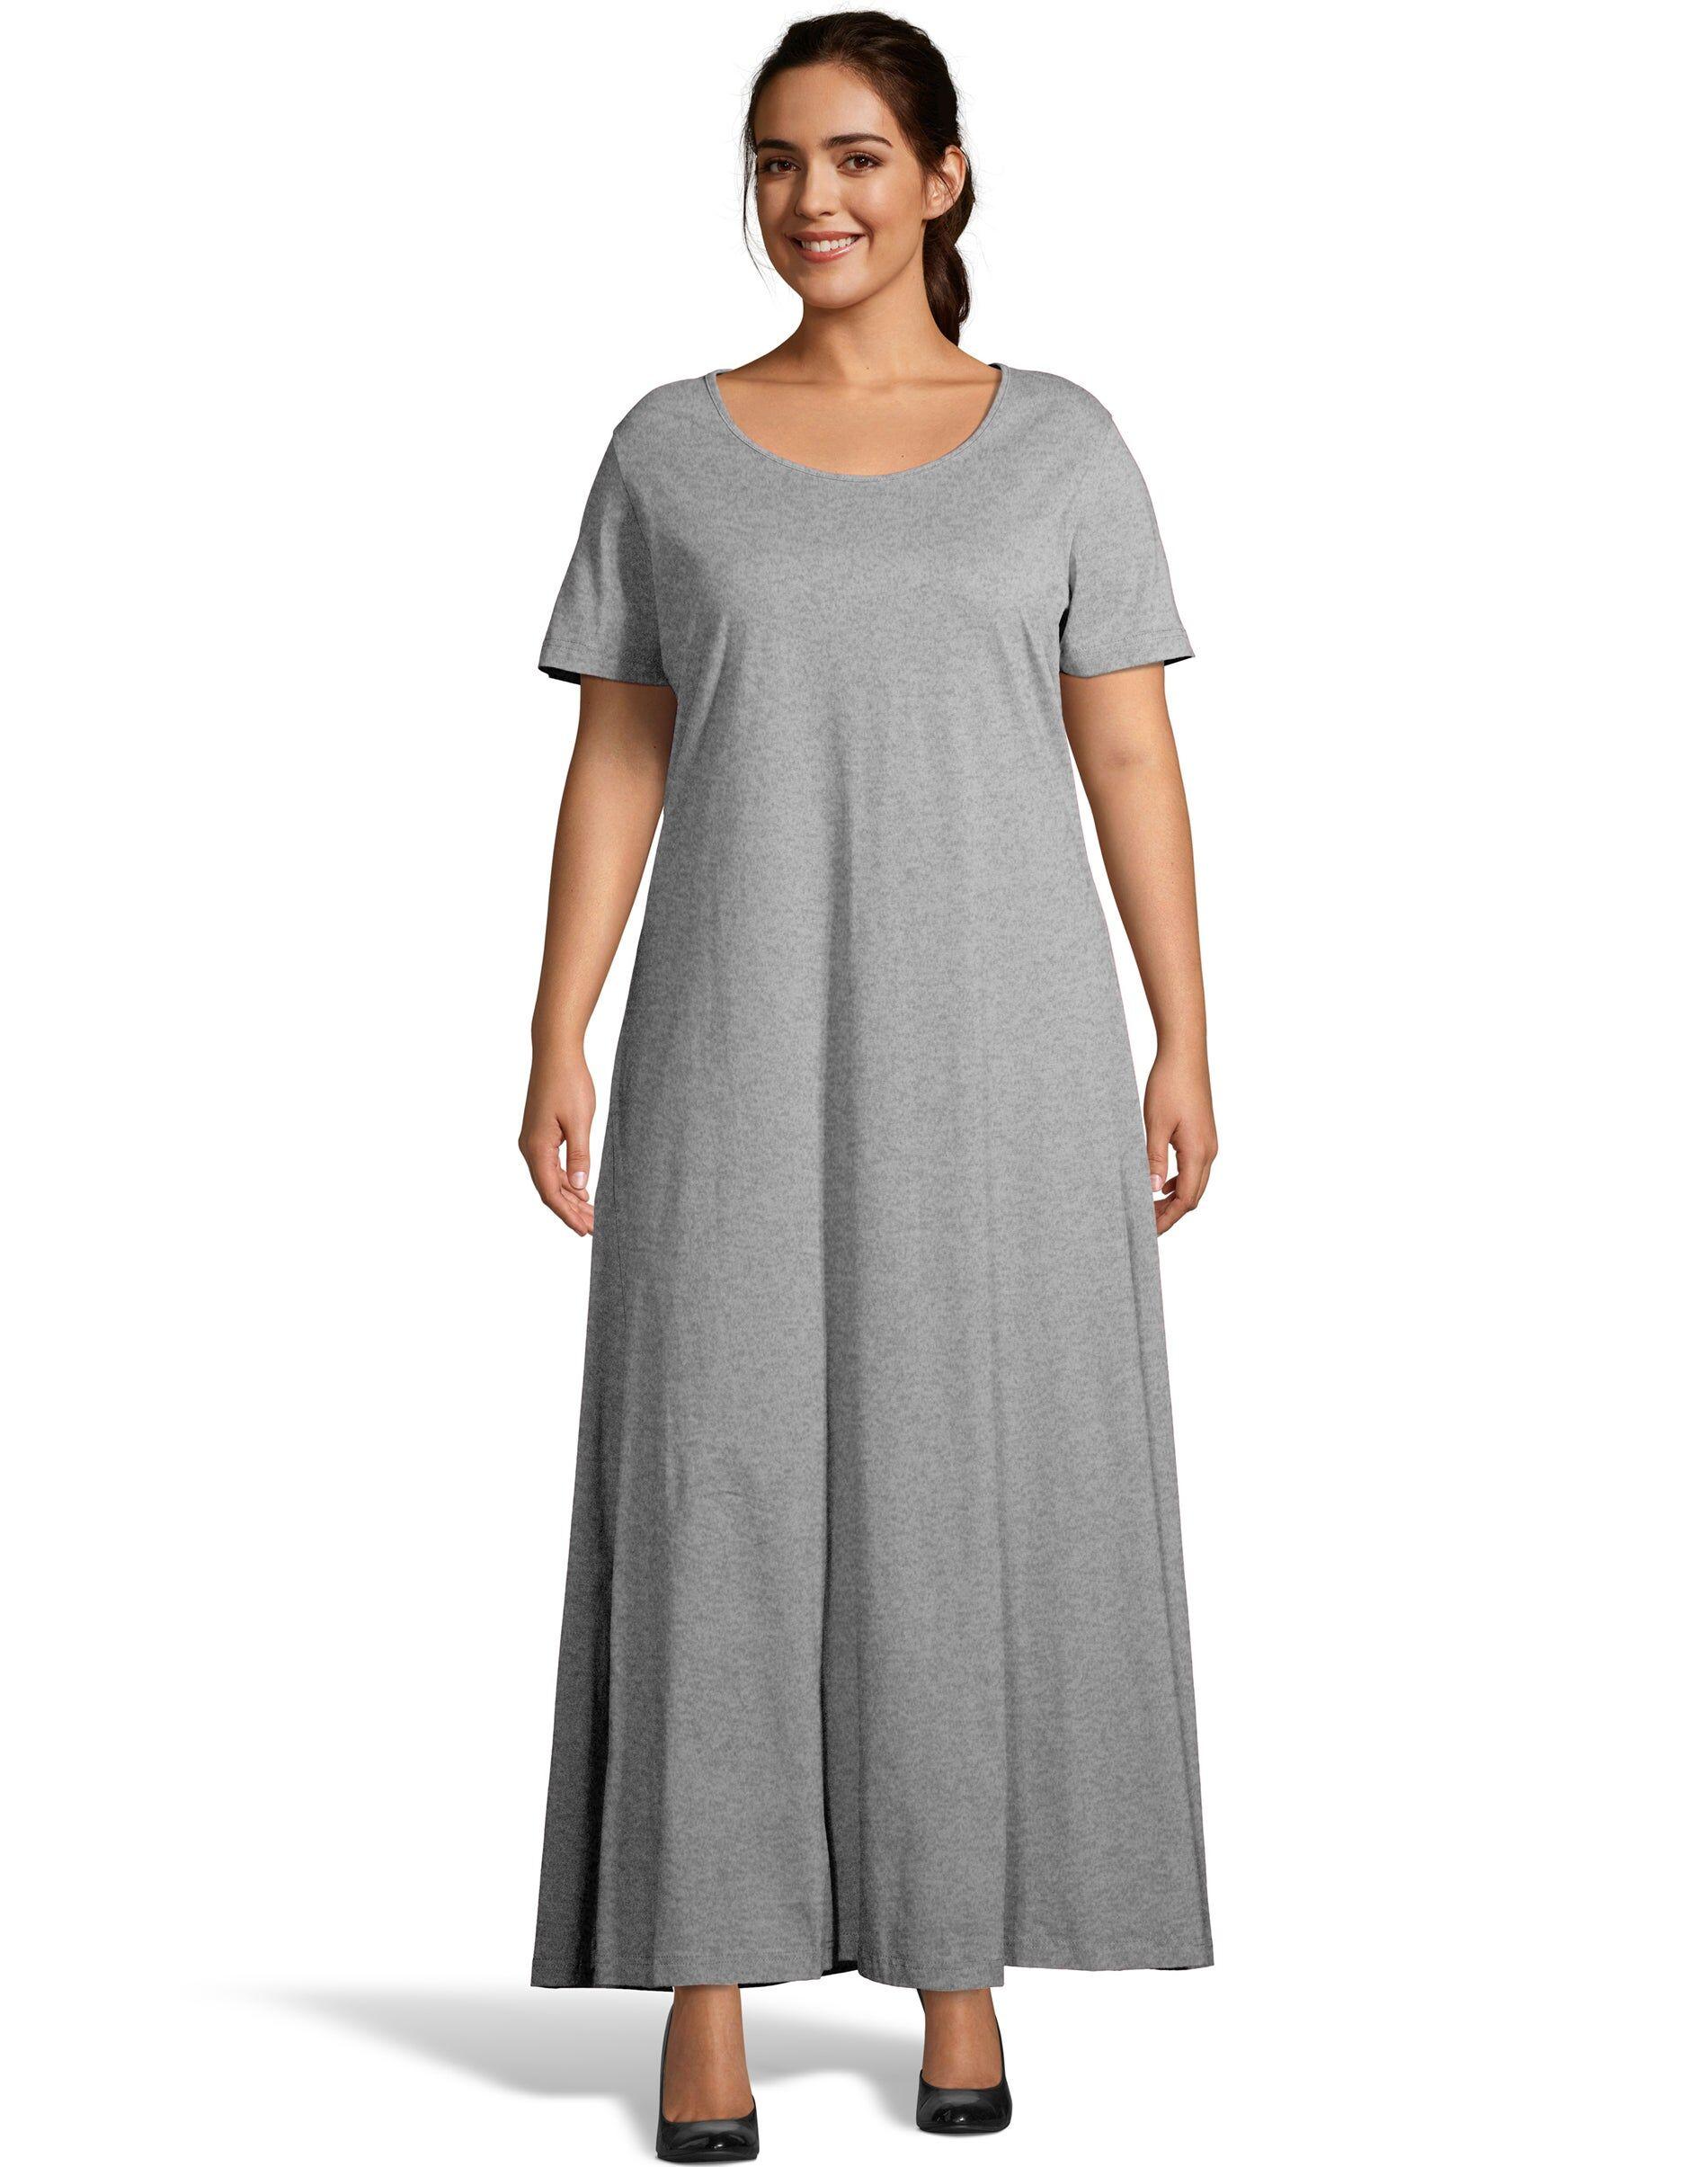 Just My Size Jersey Matchables Maxi Dress Grey Heather 5X Women's